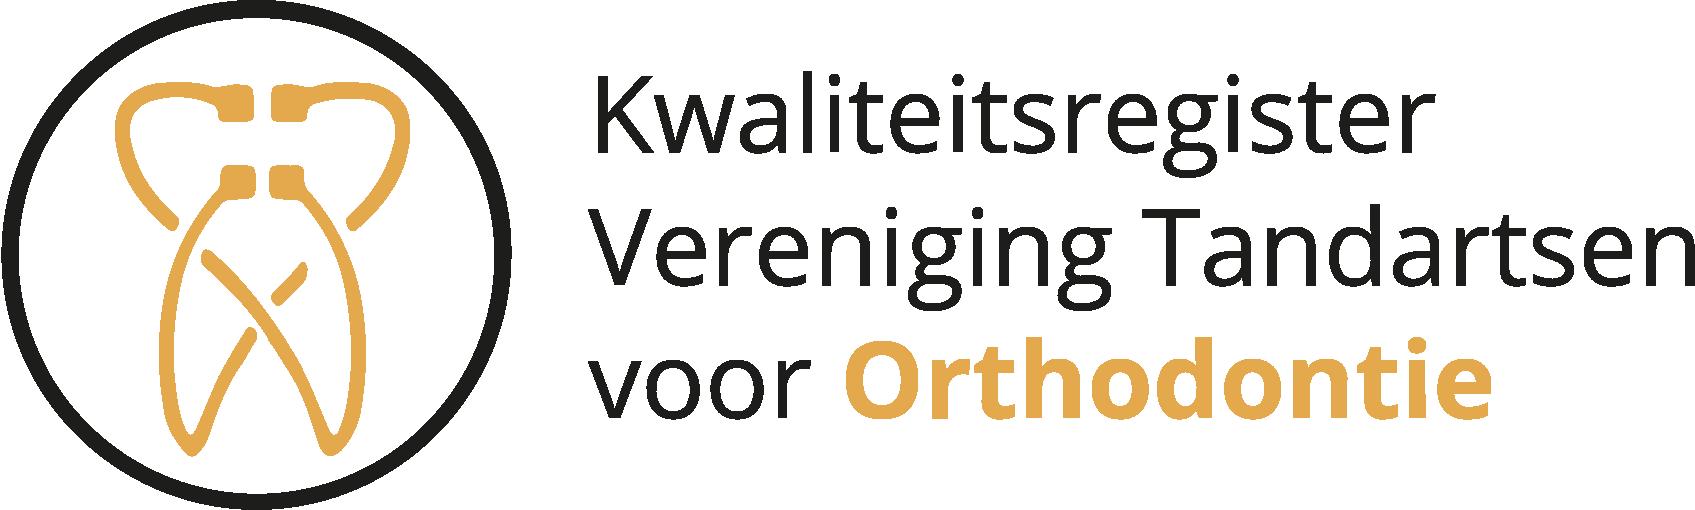 VTVO okregister logo